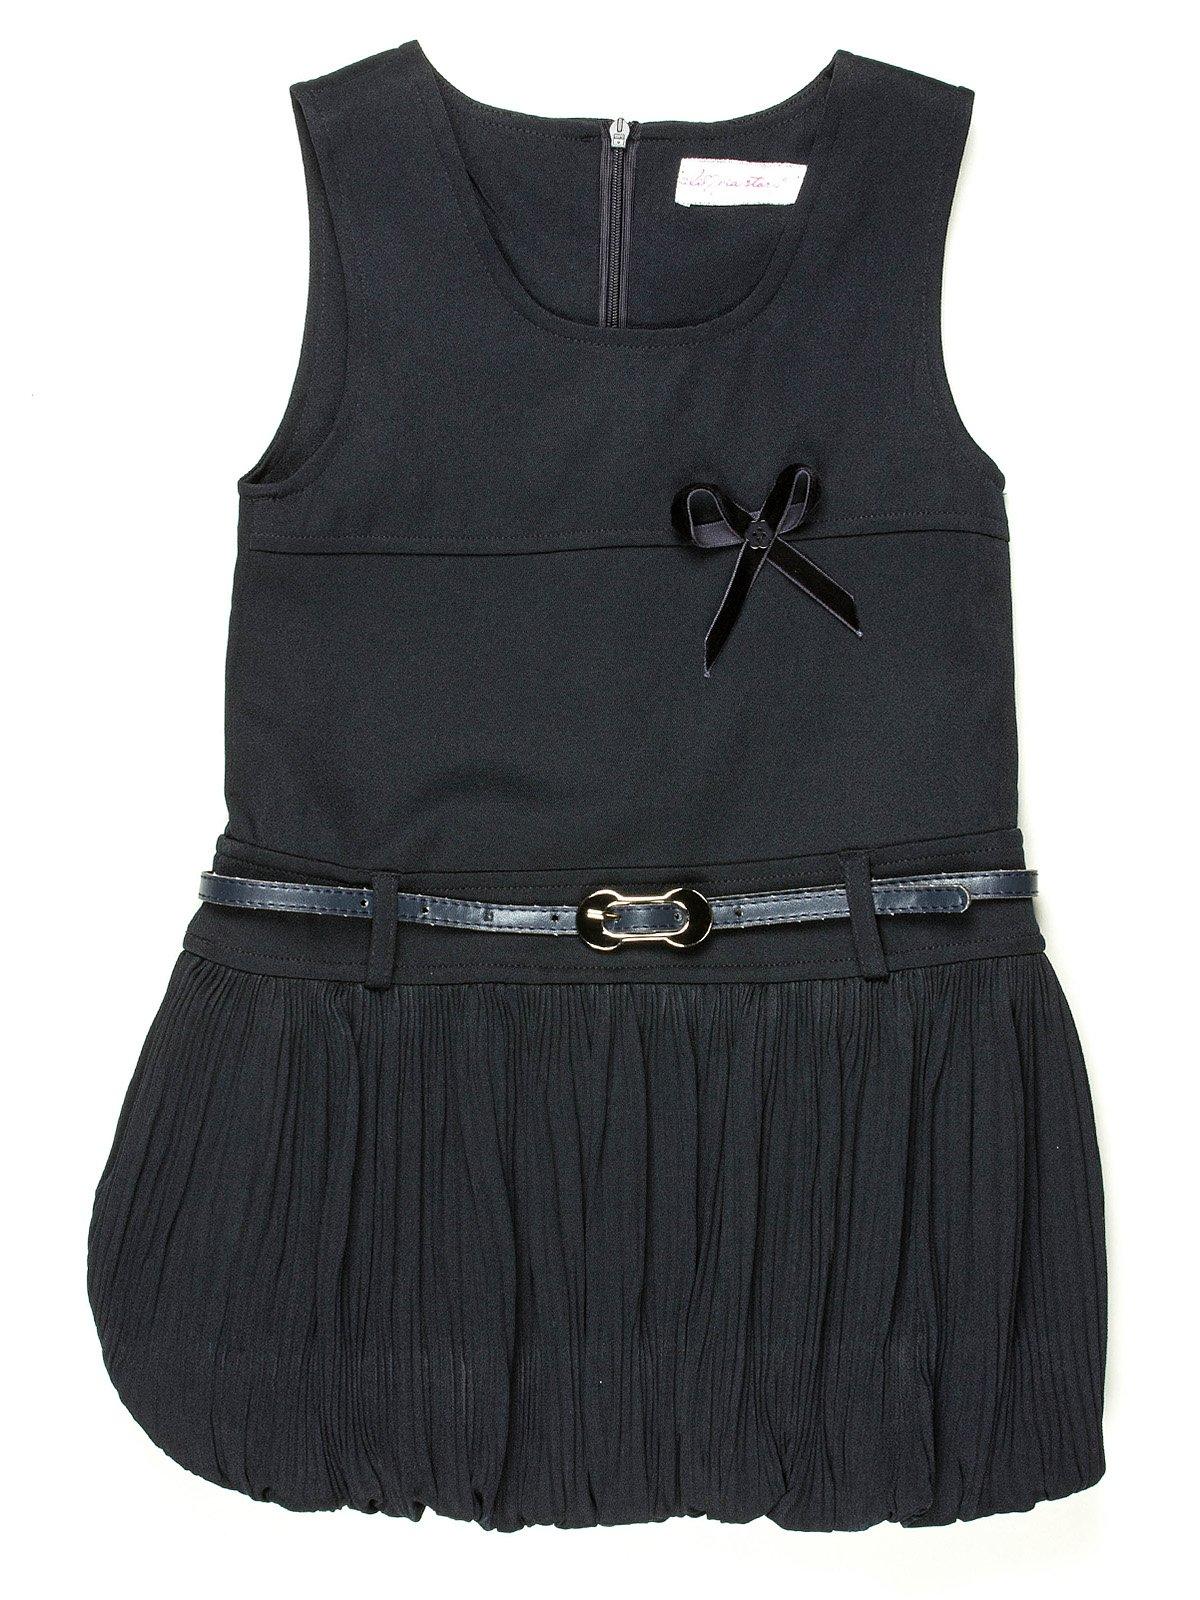 Сарафан темно-синий с юбкой-плиссе и ремешком   513979